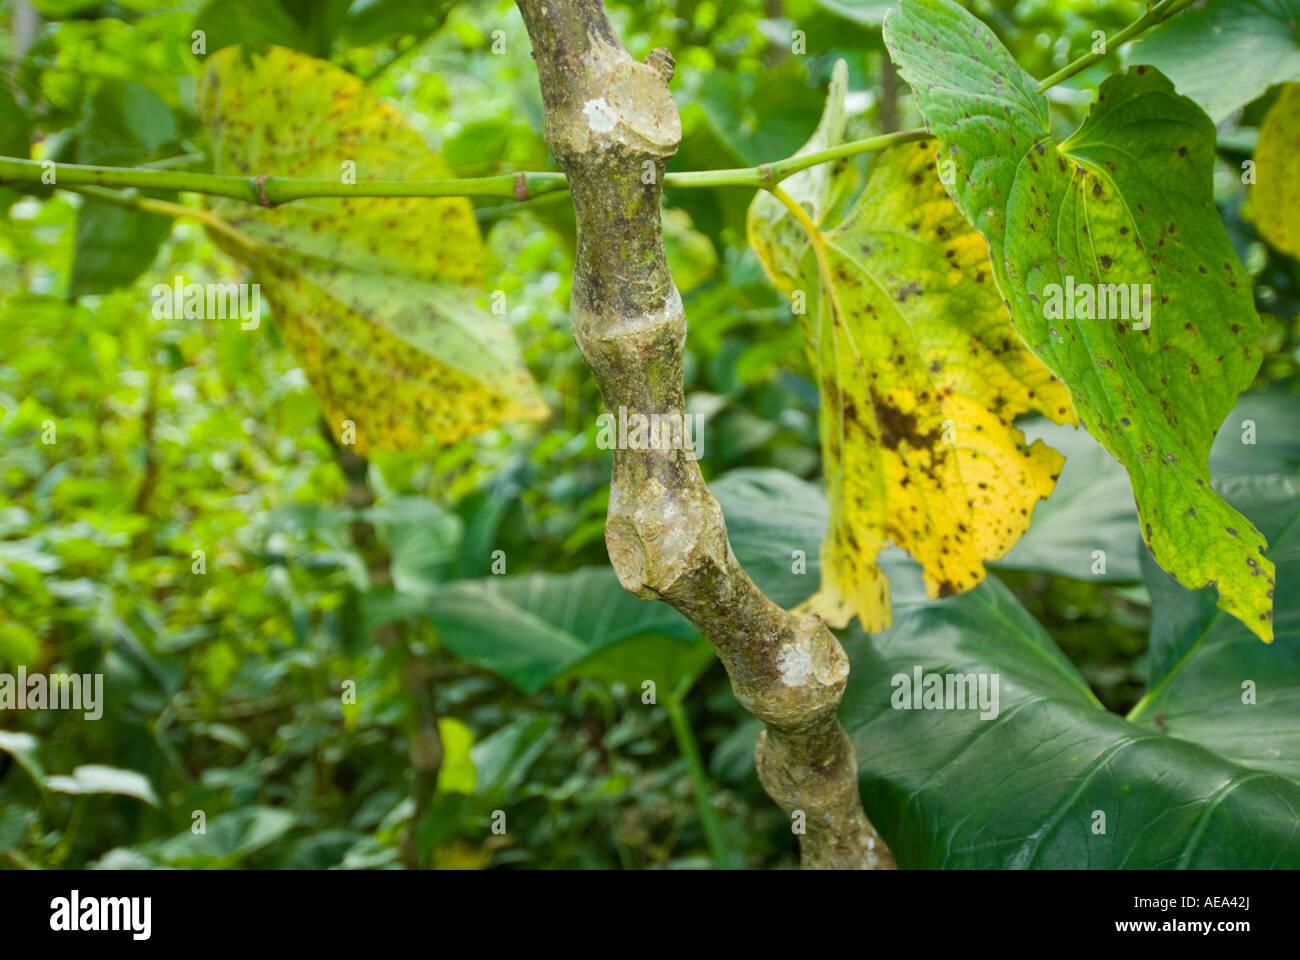 KAVA Piper methysticum fresh plant fiji Islands and leaves ritaul branch DRINK Stock Photo